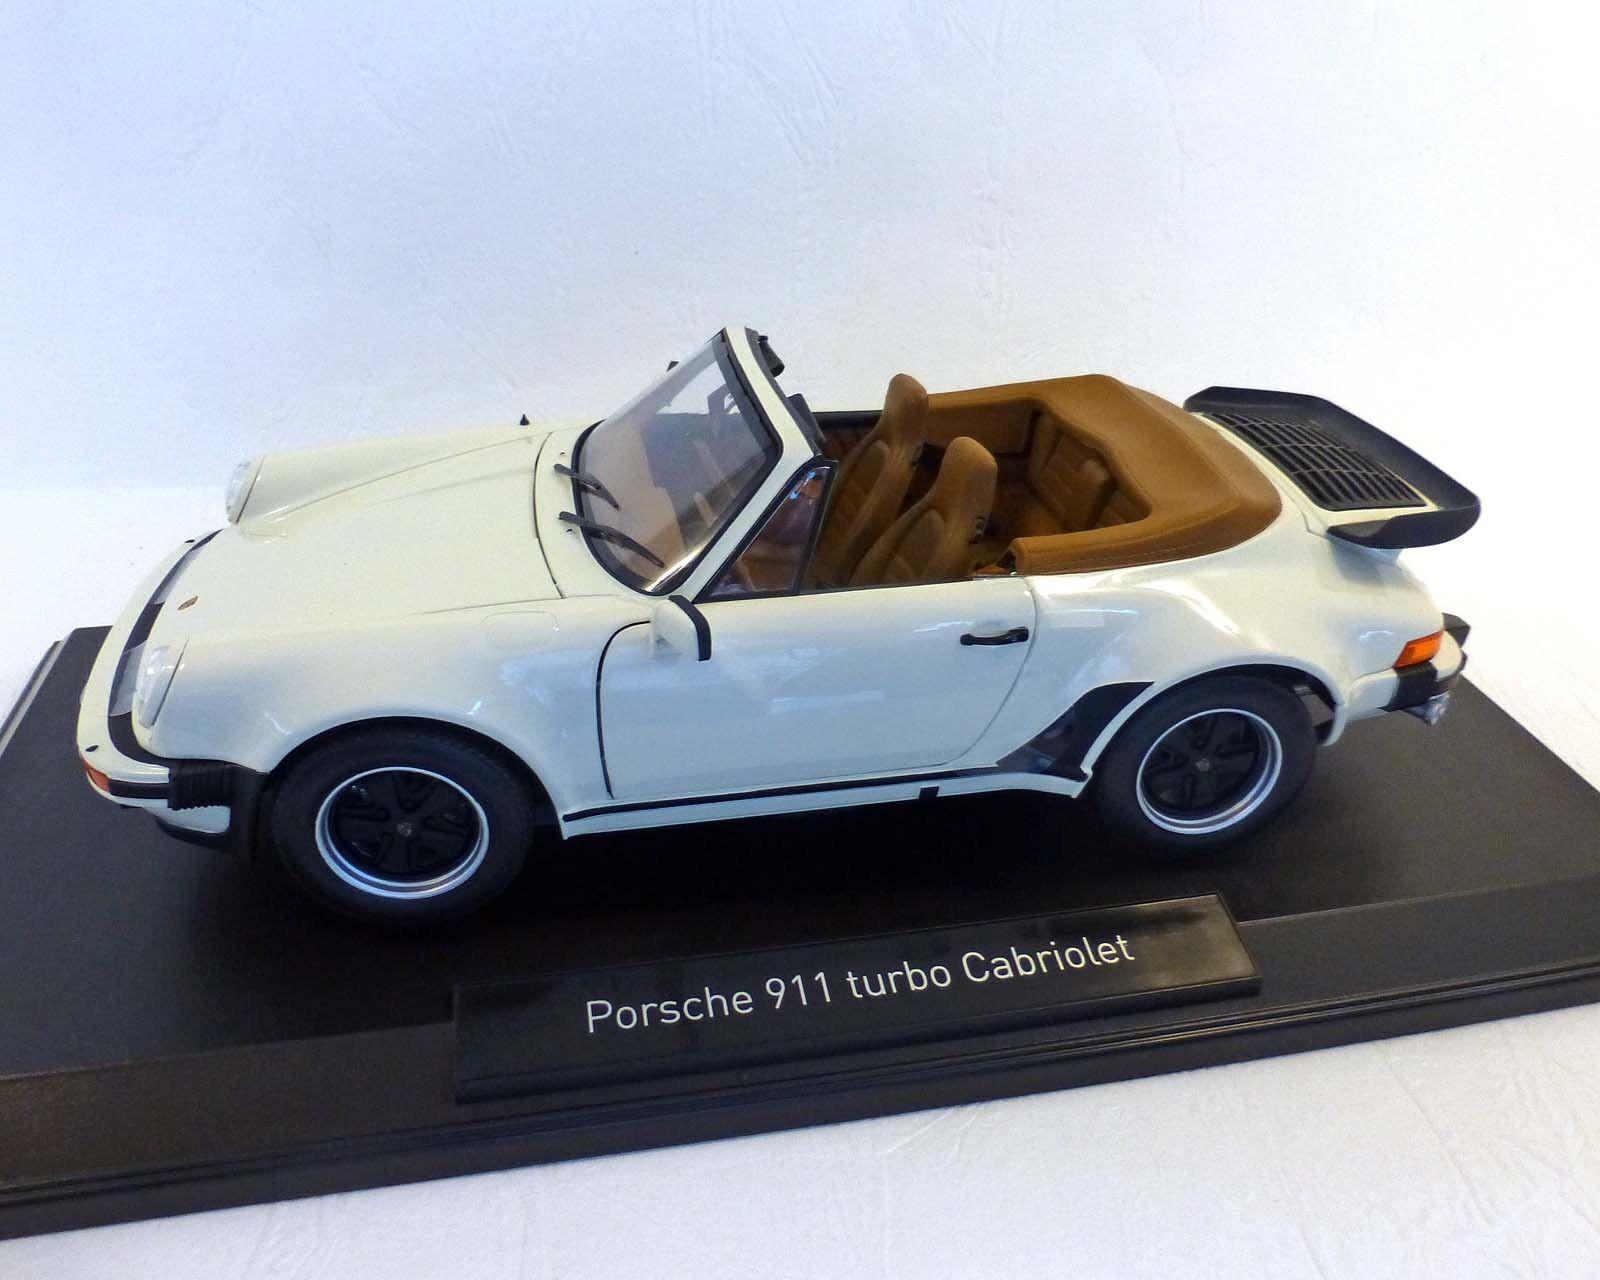 Porsche 911 Turbo Cabriolet-marfil, 1987, 1 18 norev